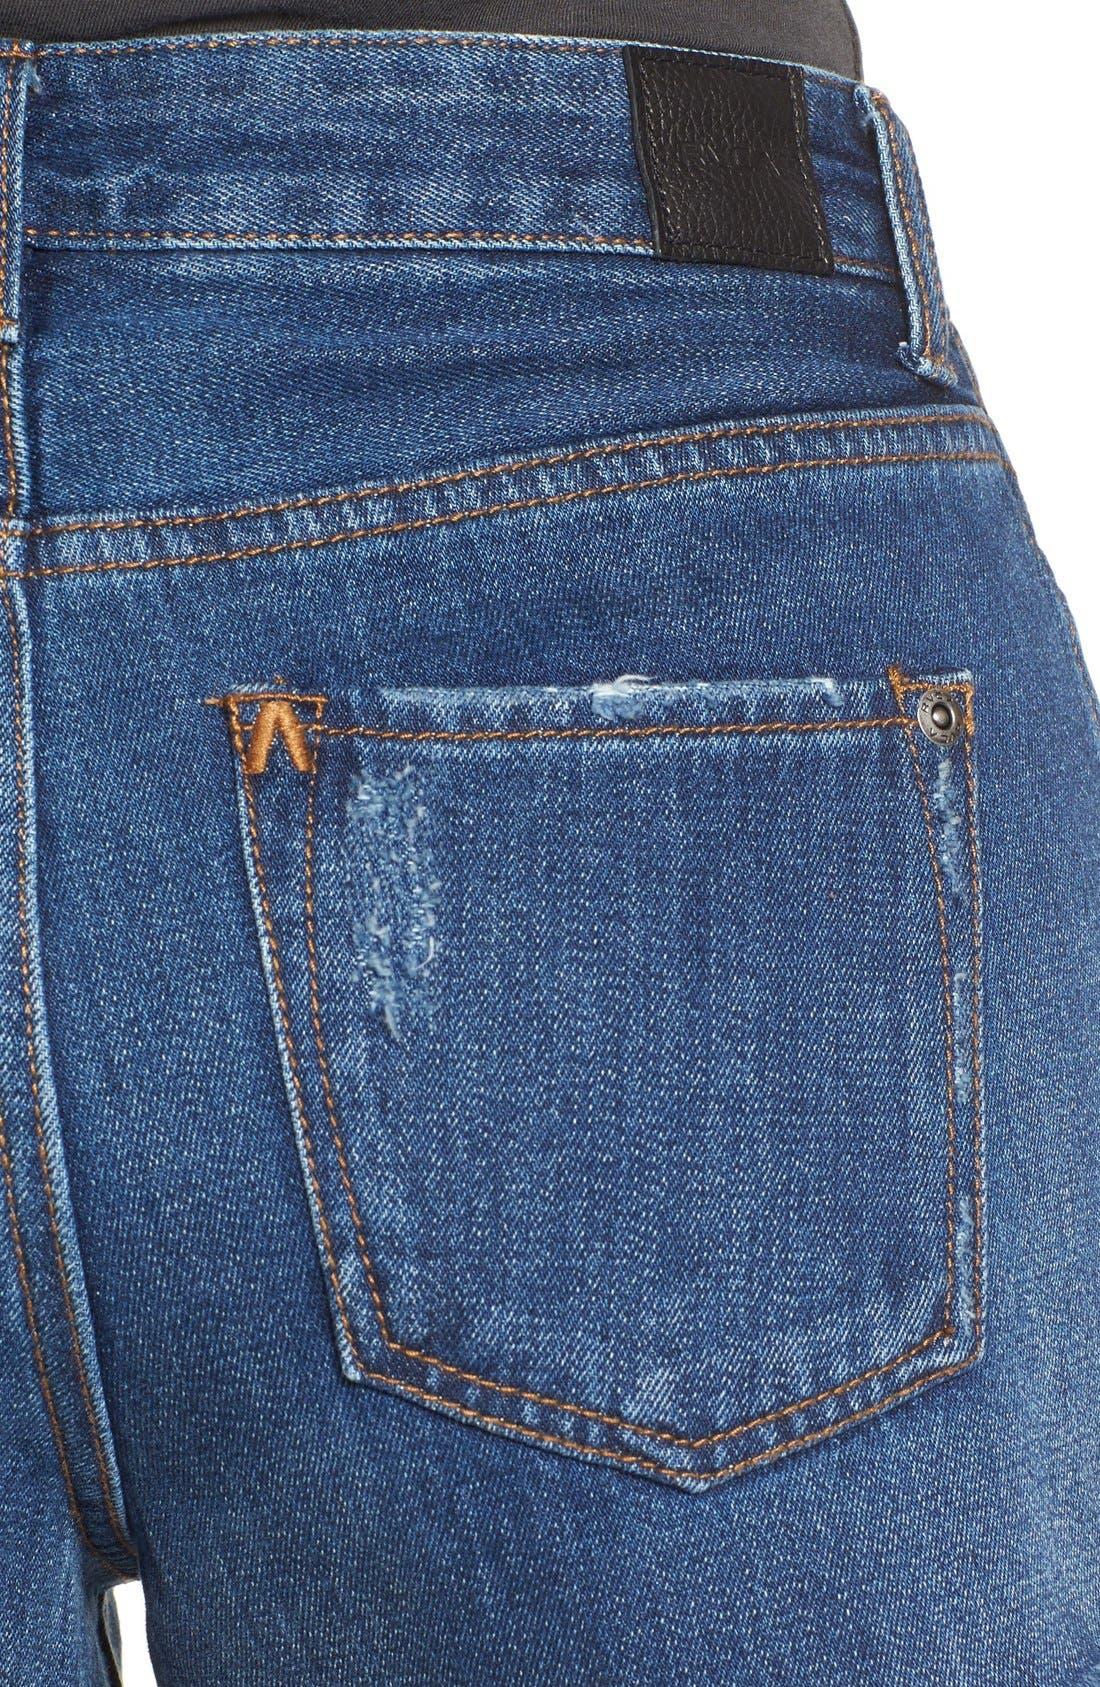 'Highly Vibed' Cutoff Denim Shorts,                             Alternate thumbnail 4, color,                             Classic Indigo